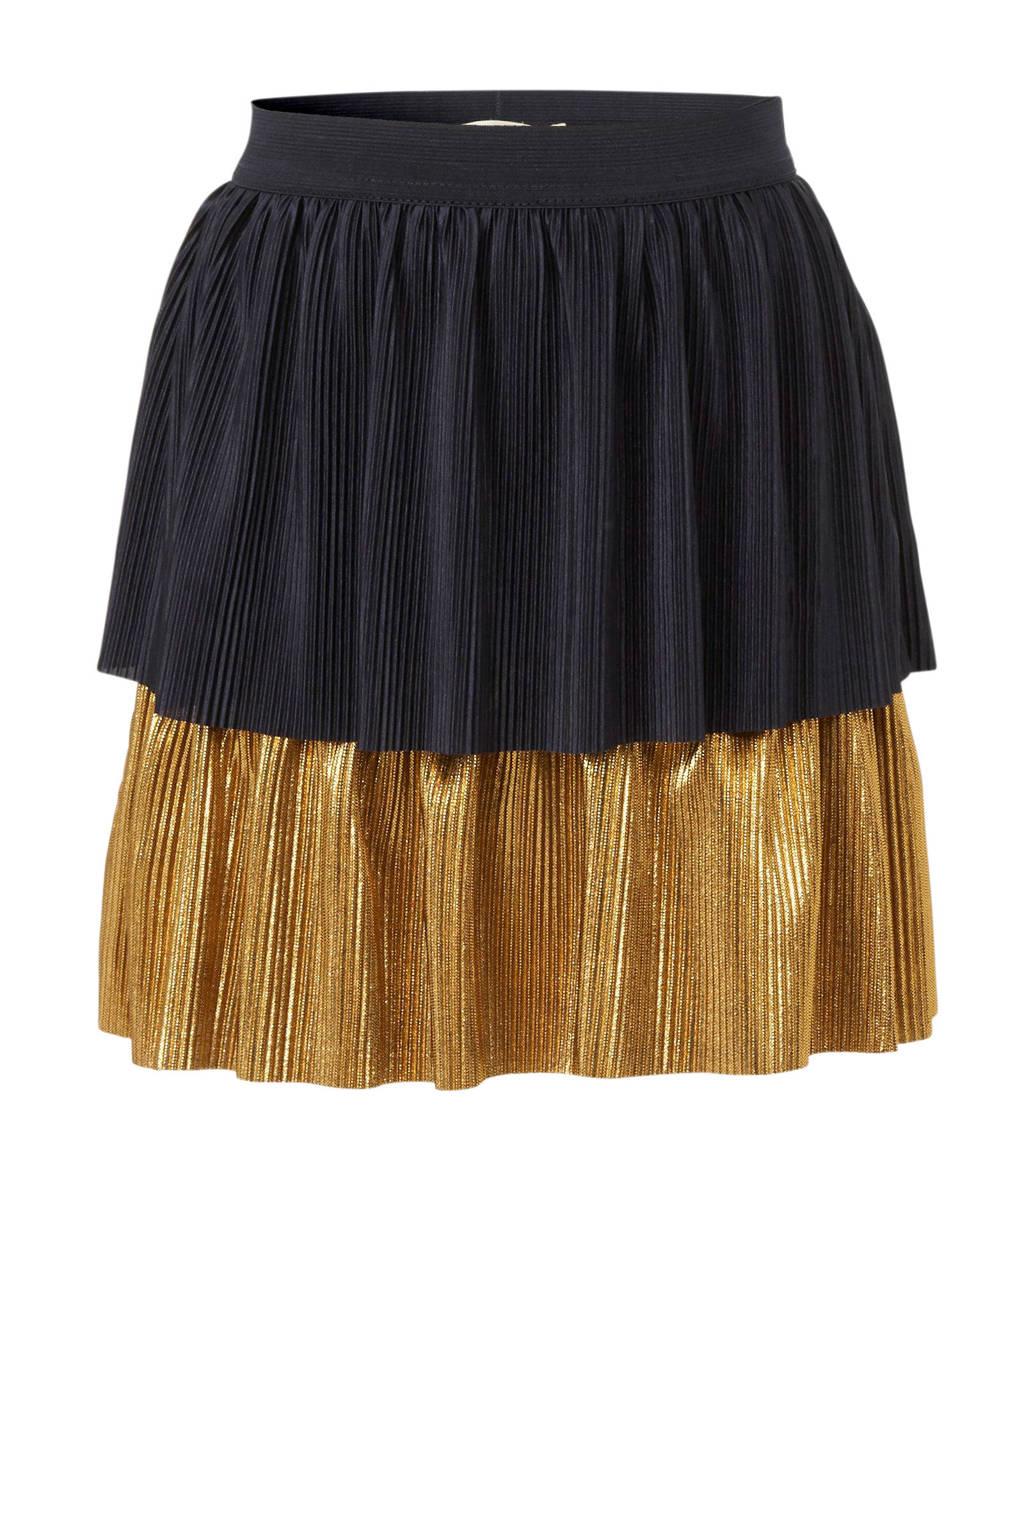 Small Rags plissérok donkerblauw/goud, Donkerblauw/goud